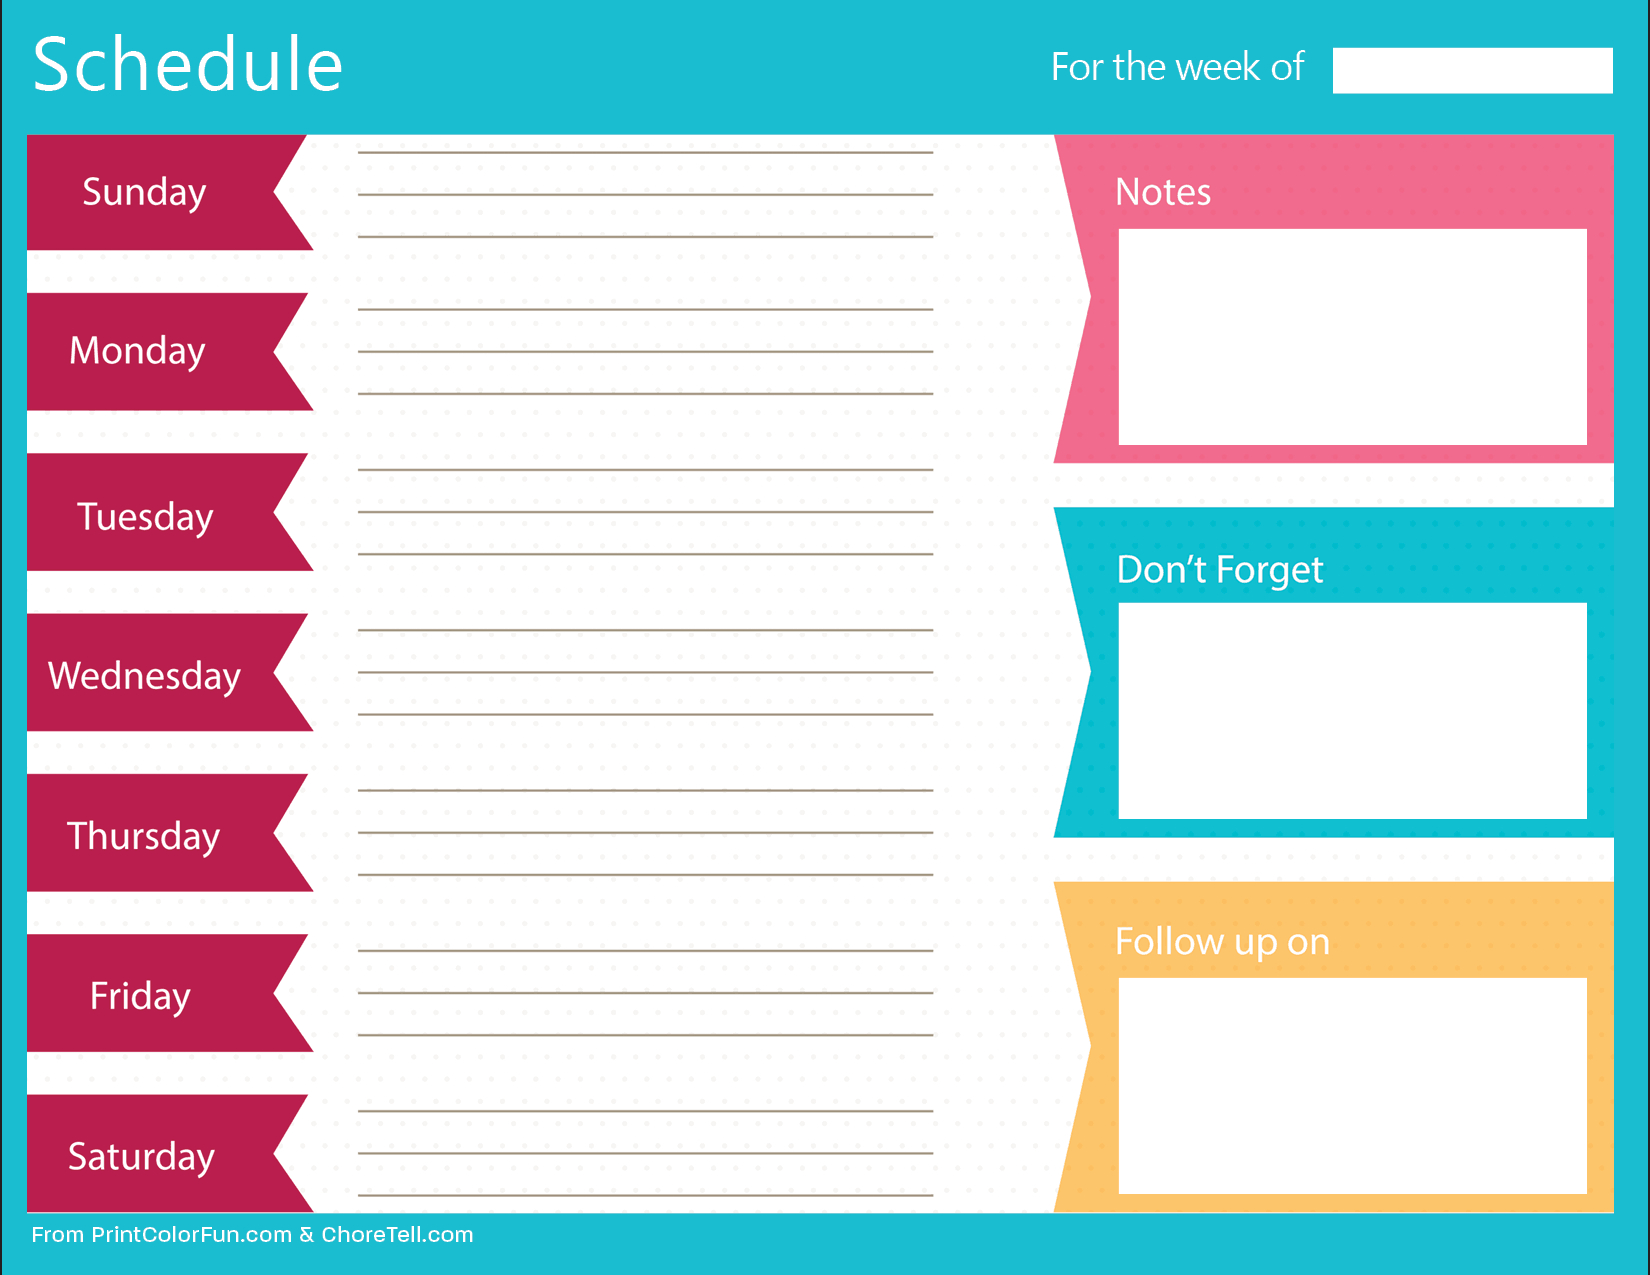 Clean, Bold Printable Weekly Schedule Planner - Free intended for Weekly Planner Printable Free Photo